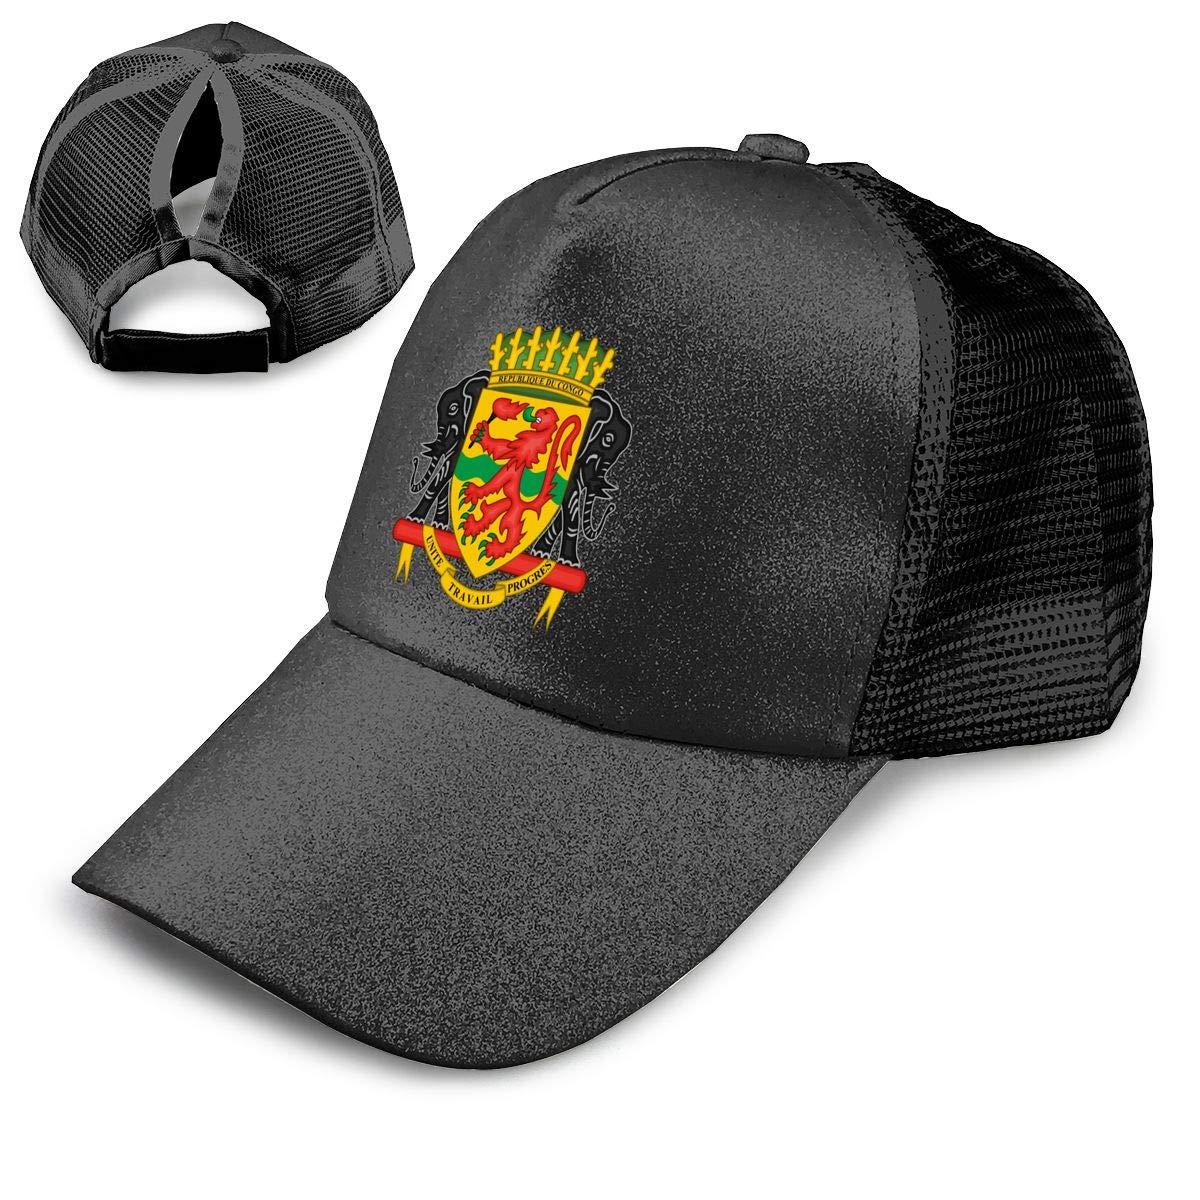 Ponytail Messy High Bun Hat Ponycaps Baseball Cap Adjustable Trucker Cap Mesh Cap